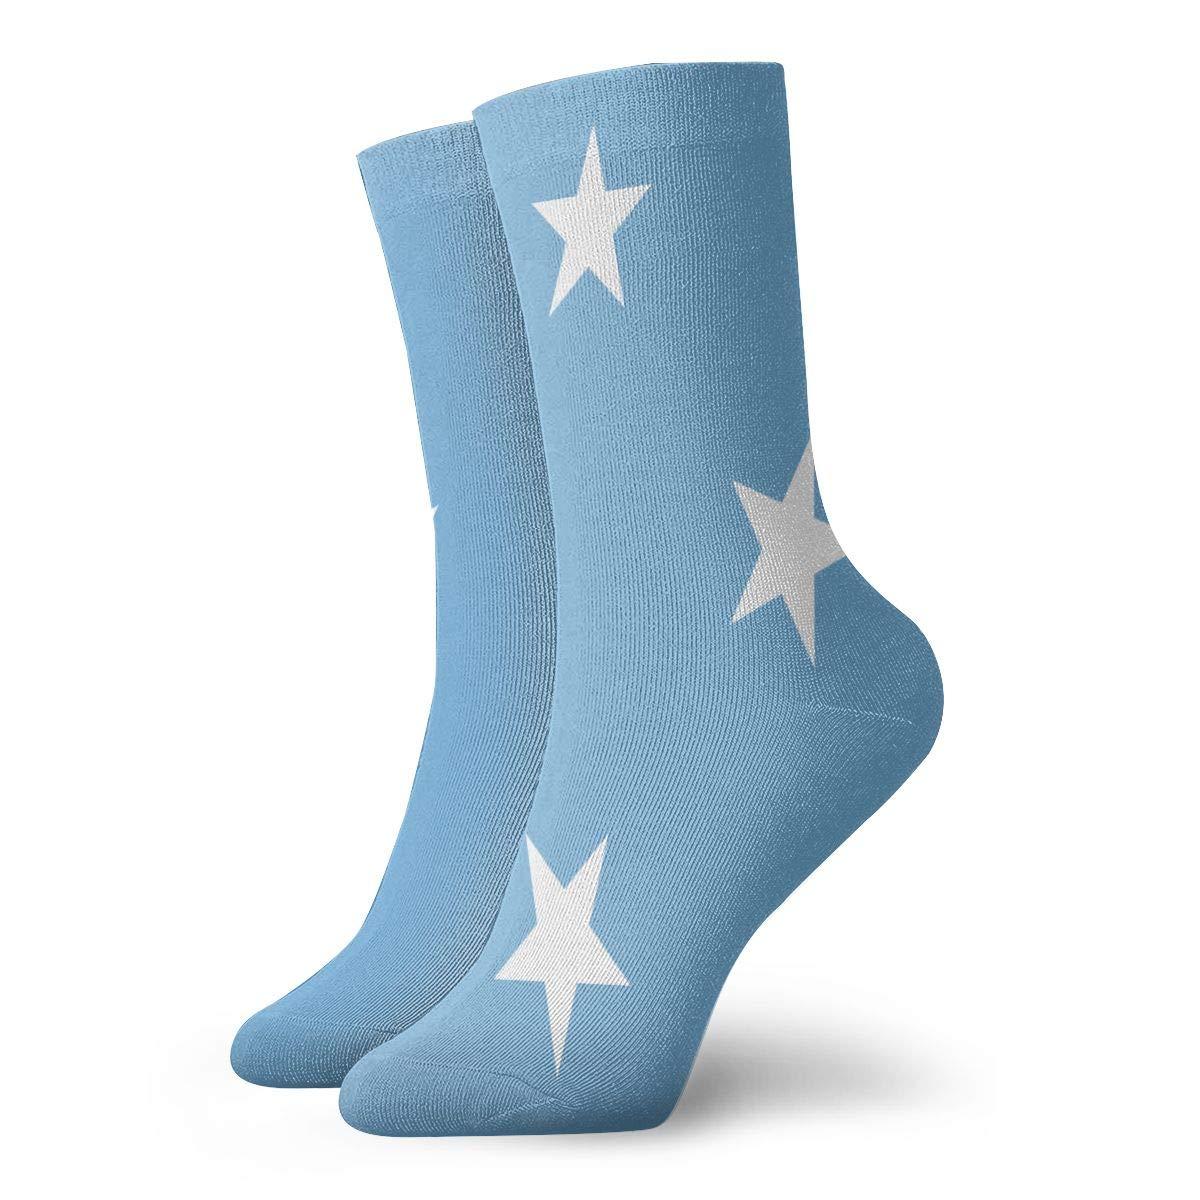 SESY Micronesia Flag Unisex Crew Socks Short Sports Stocking